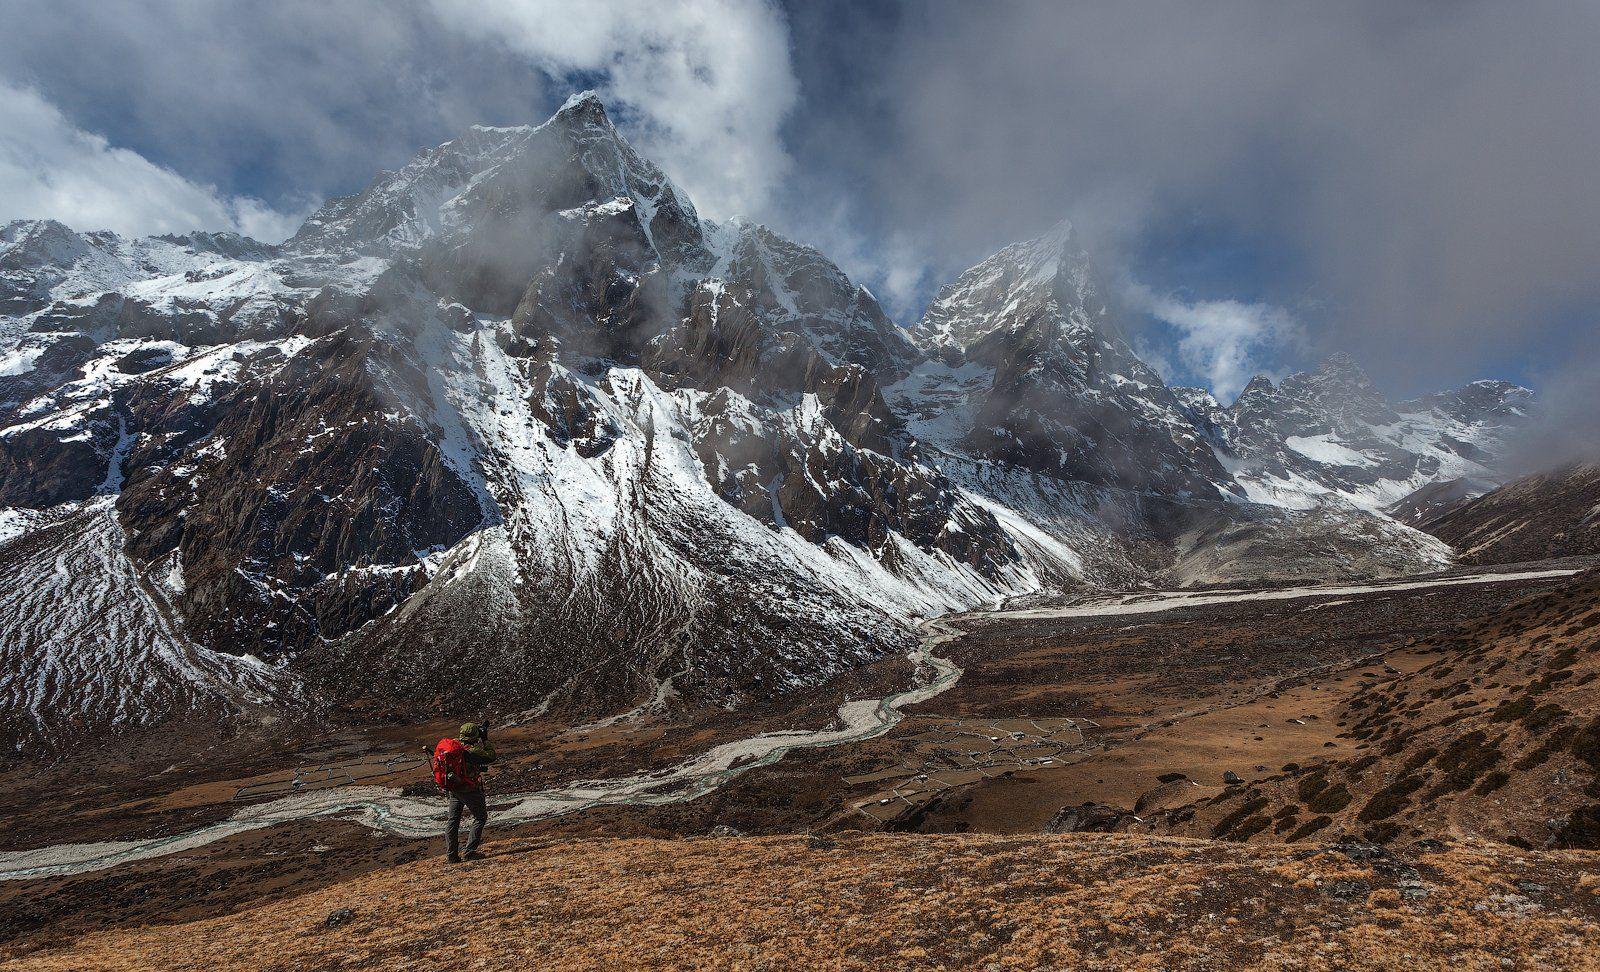 непал, эверест, гималаи, nepal, everest, himalayas, Шевченко Юрий